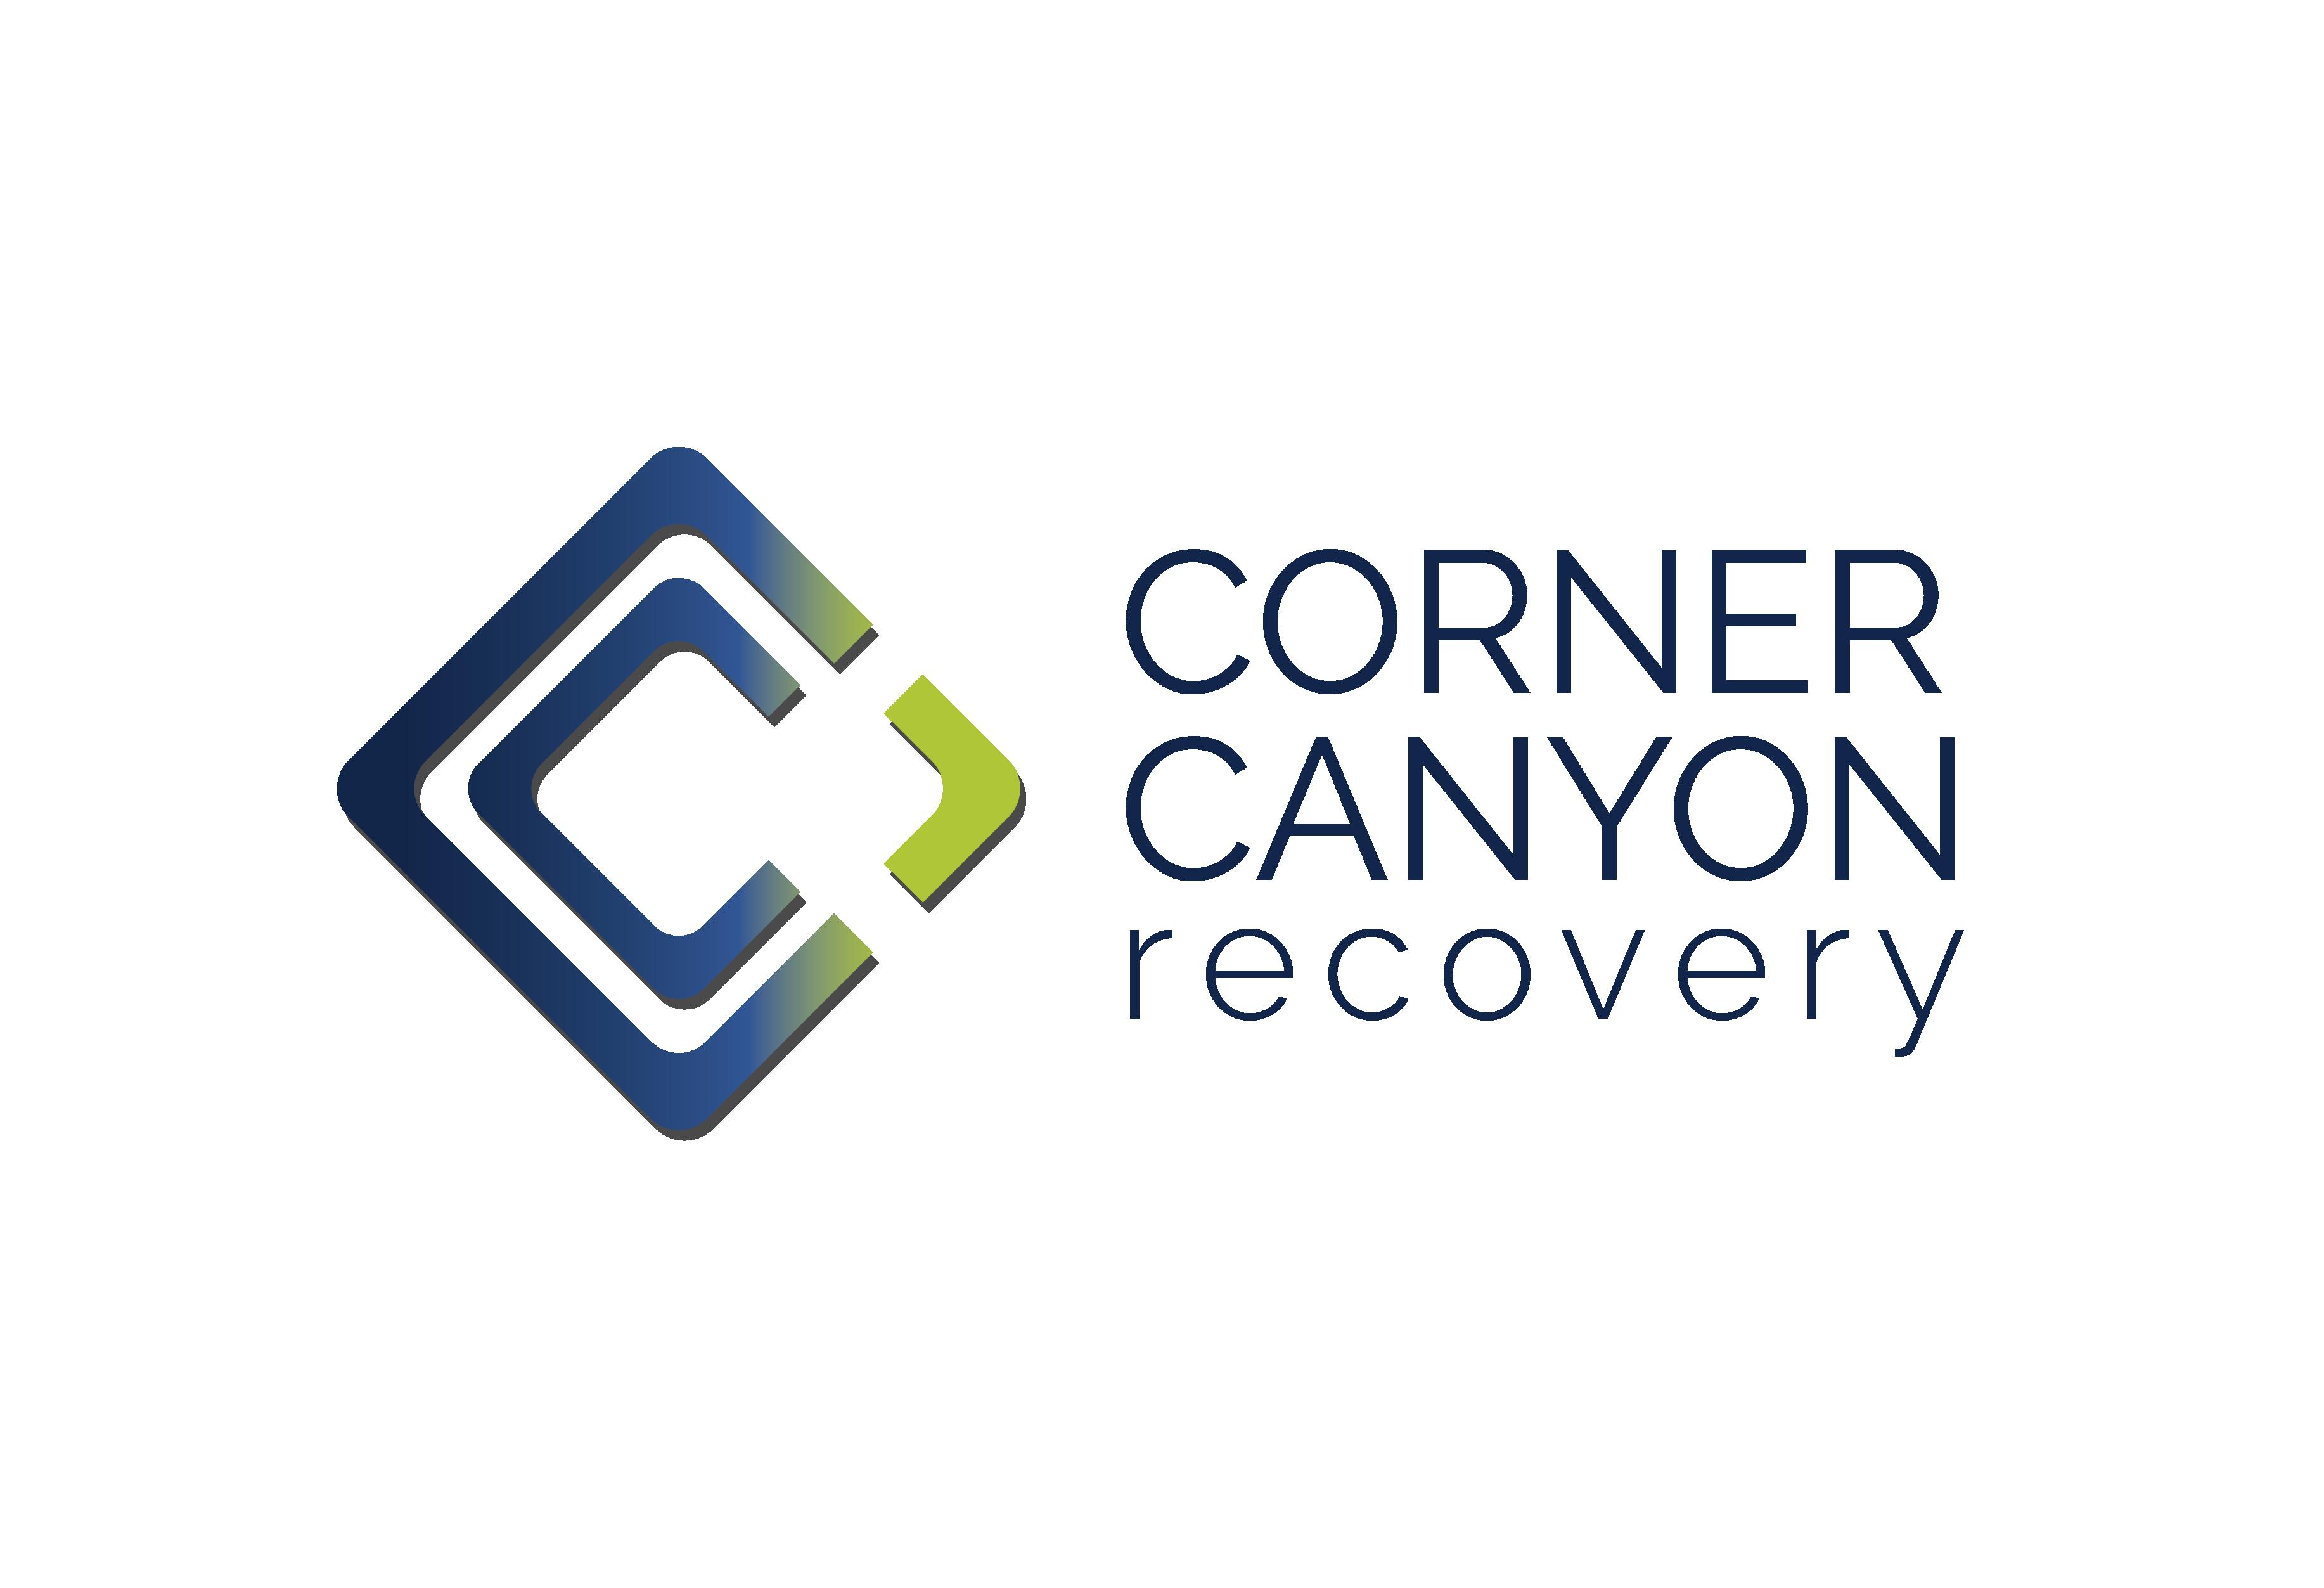 Corner Canyon Recovery logo